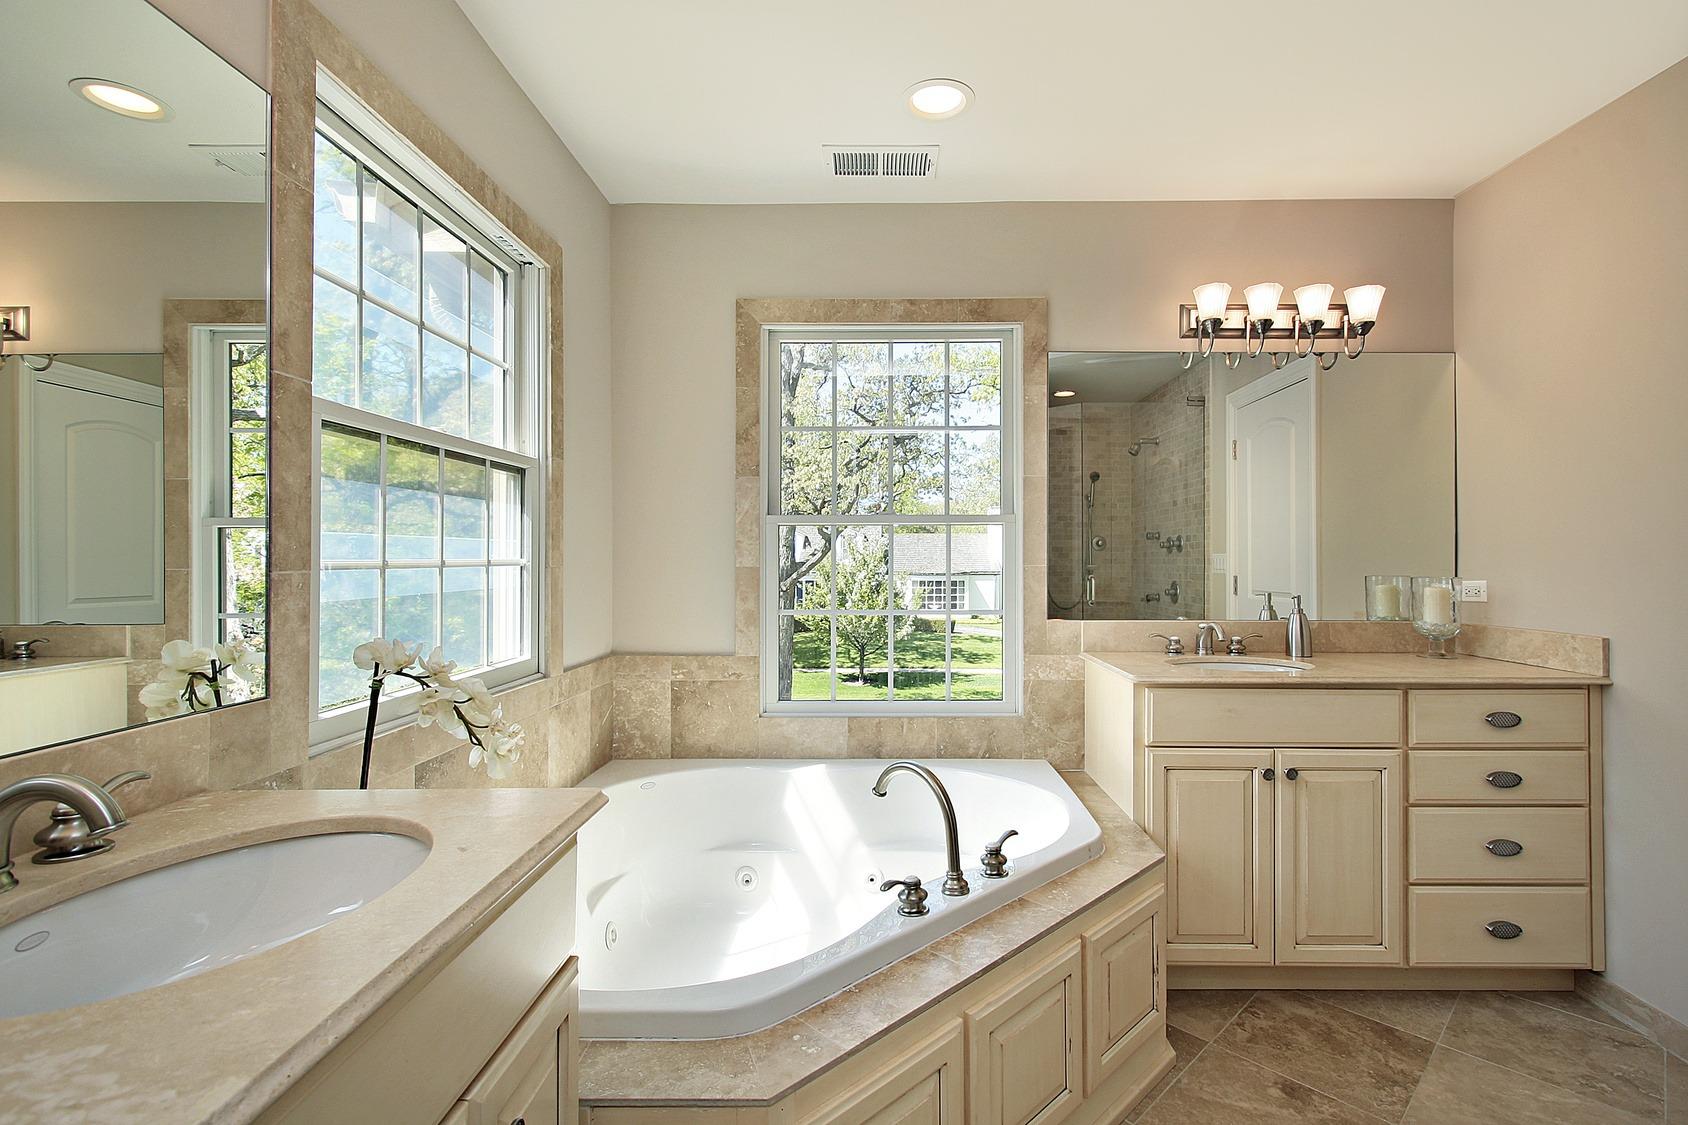 Master bath with tub - Classic Remodeling NW, Inc. on Master Bath Remodel Ideas  id=95856